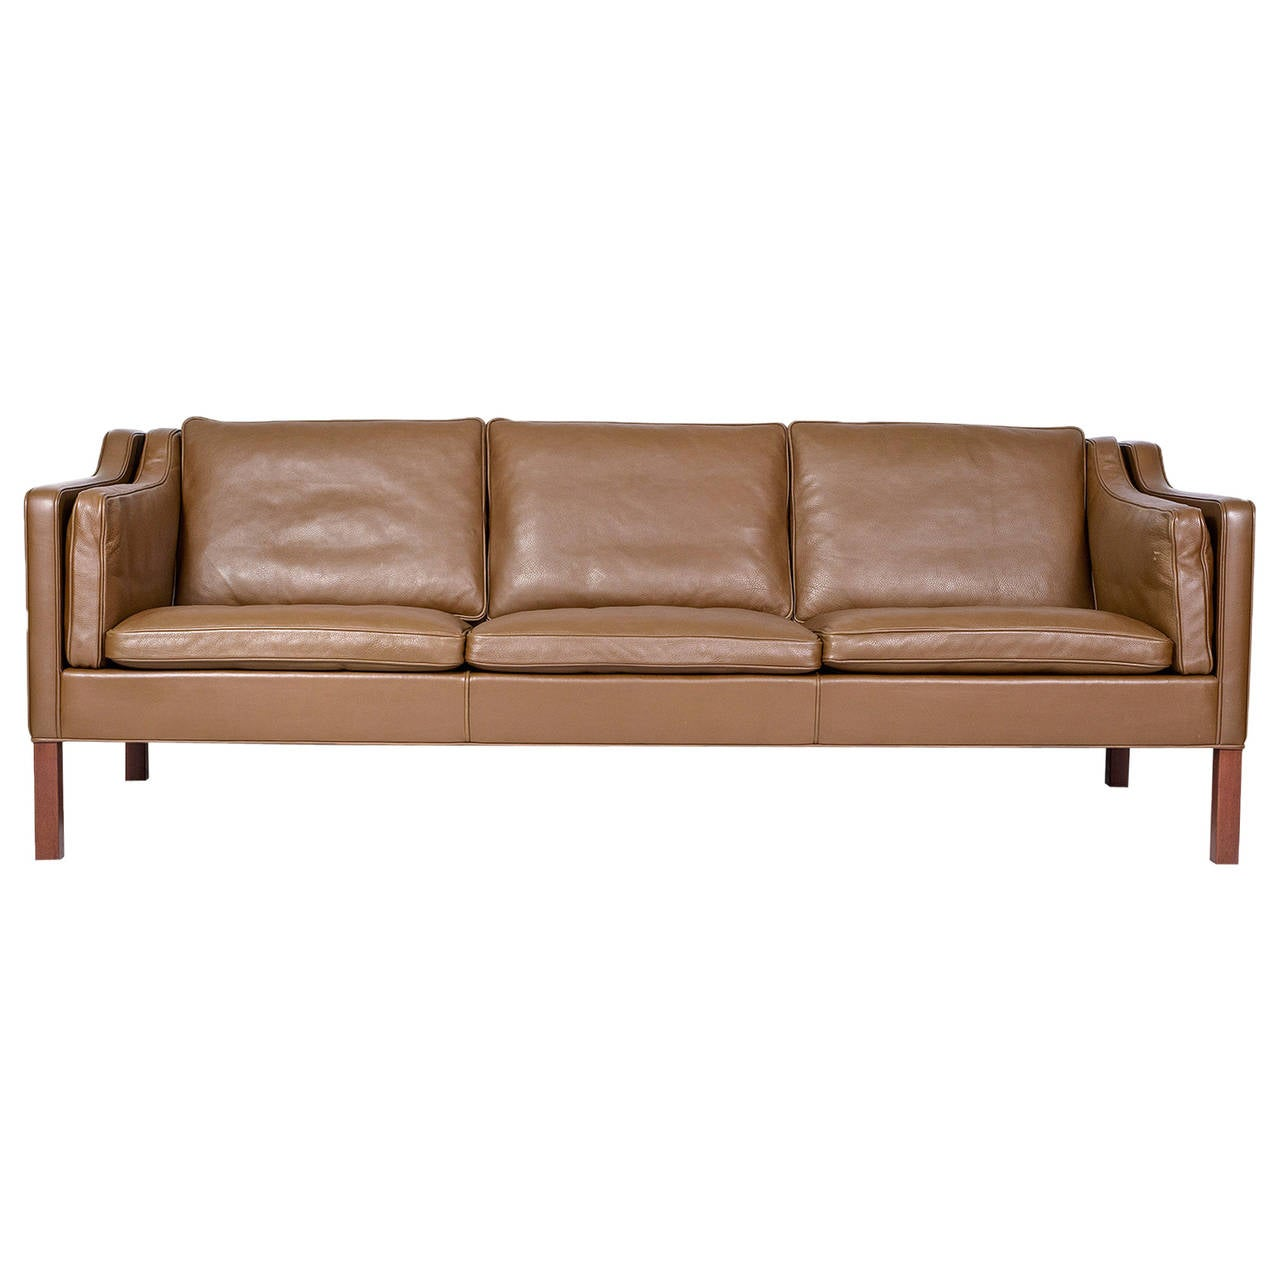 borge mogensen sofa model 2209 donde comprar sofas baratos en vizcaya 2213 three seat leather at 1stdibs